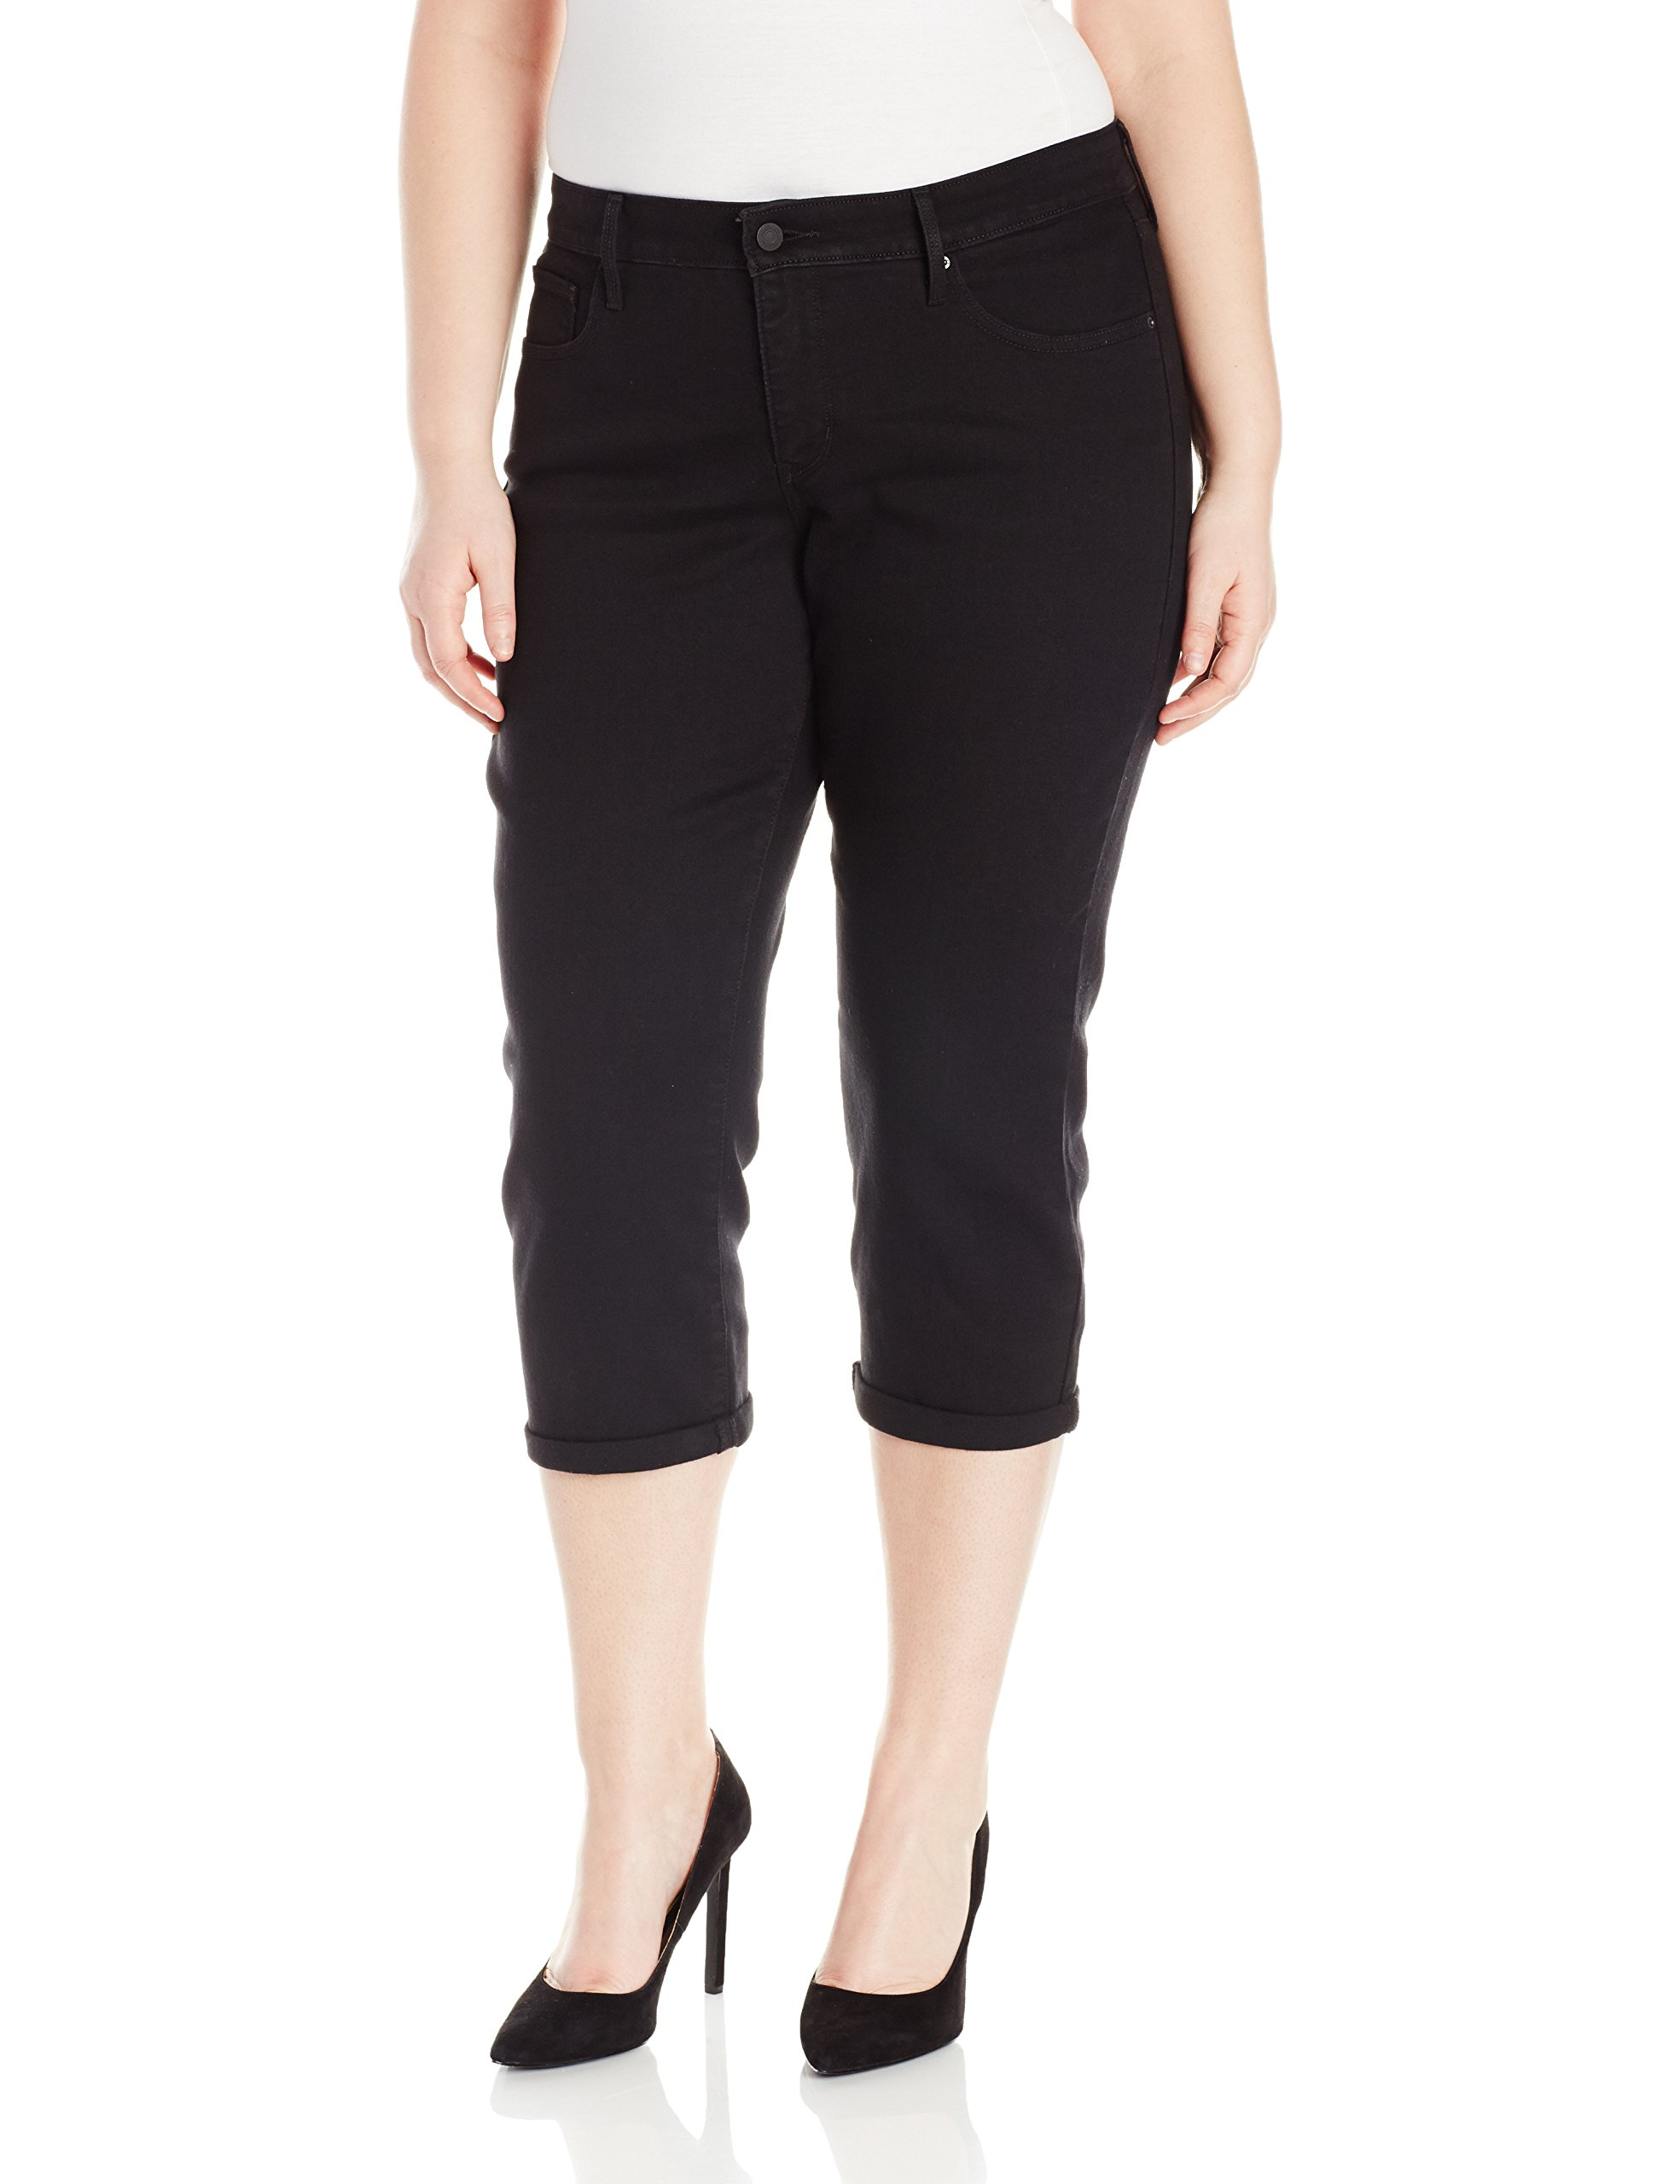 Line On Find At Levi Deals Jeans Capri Cheap Jeans wZBq7UW